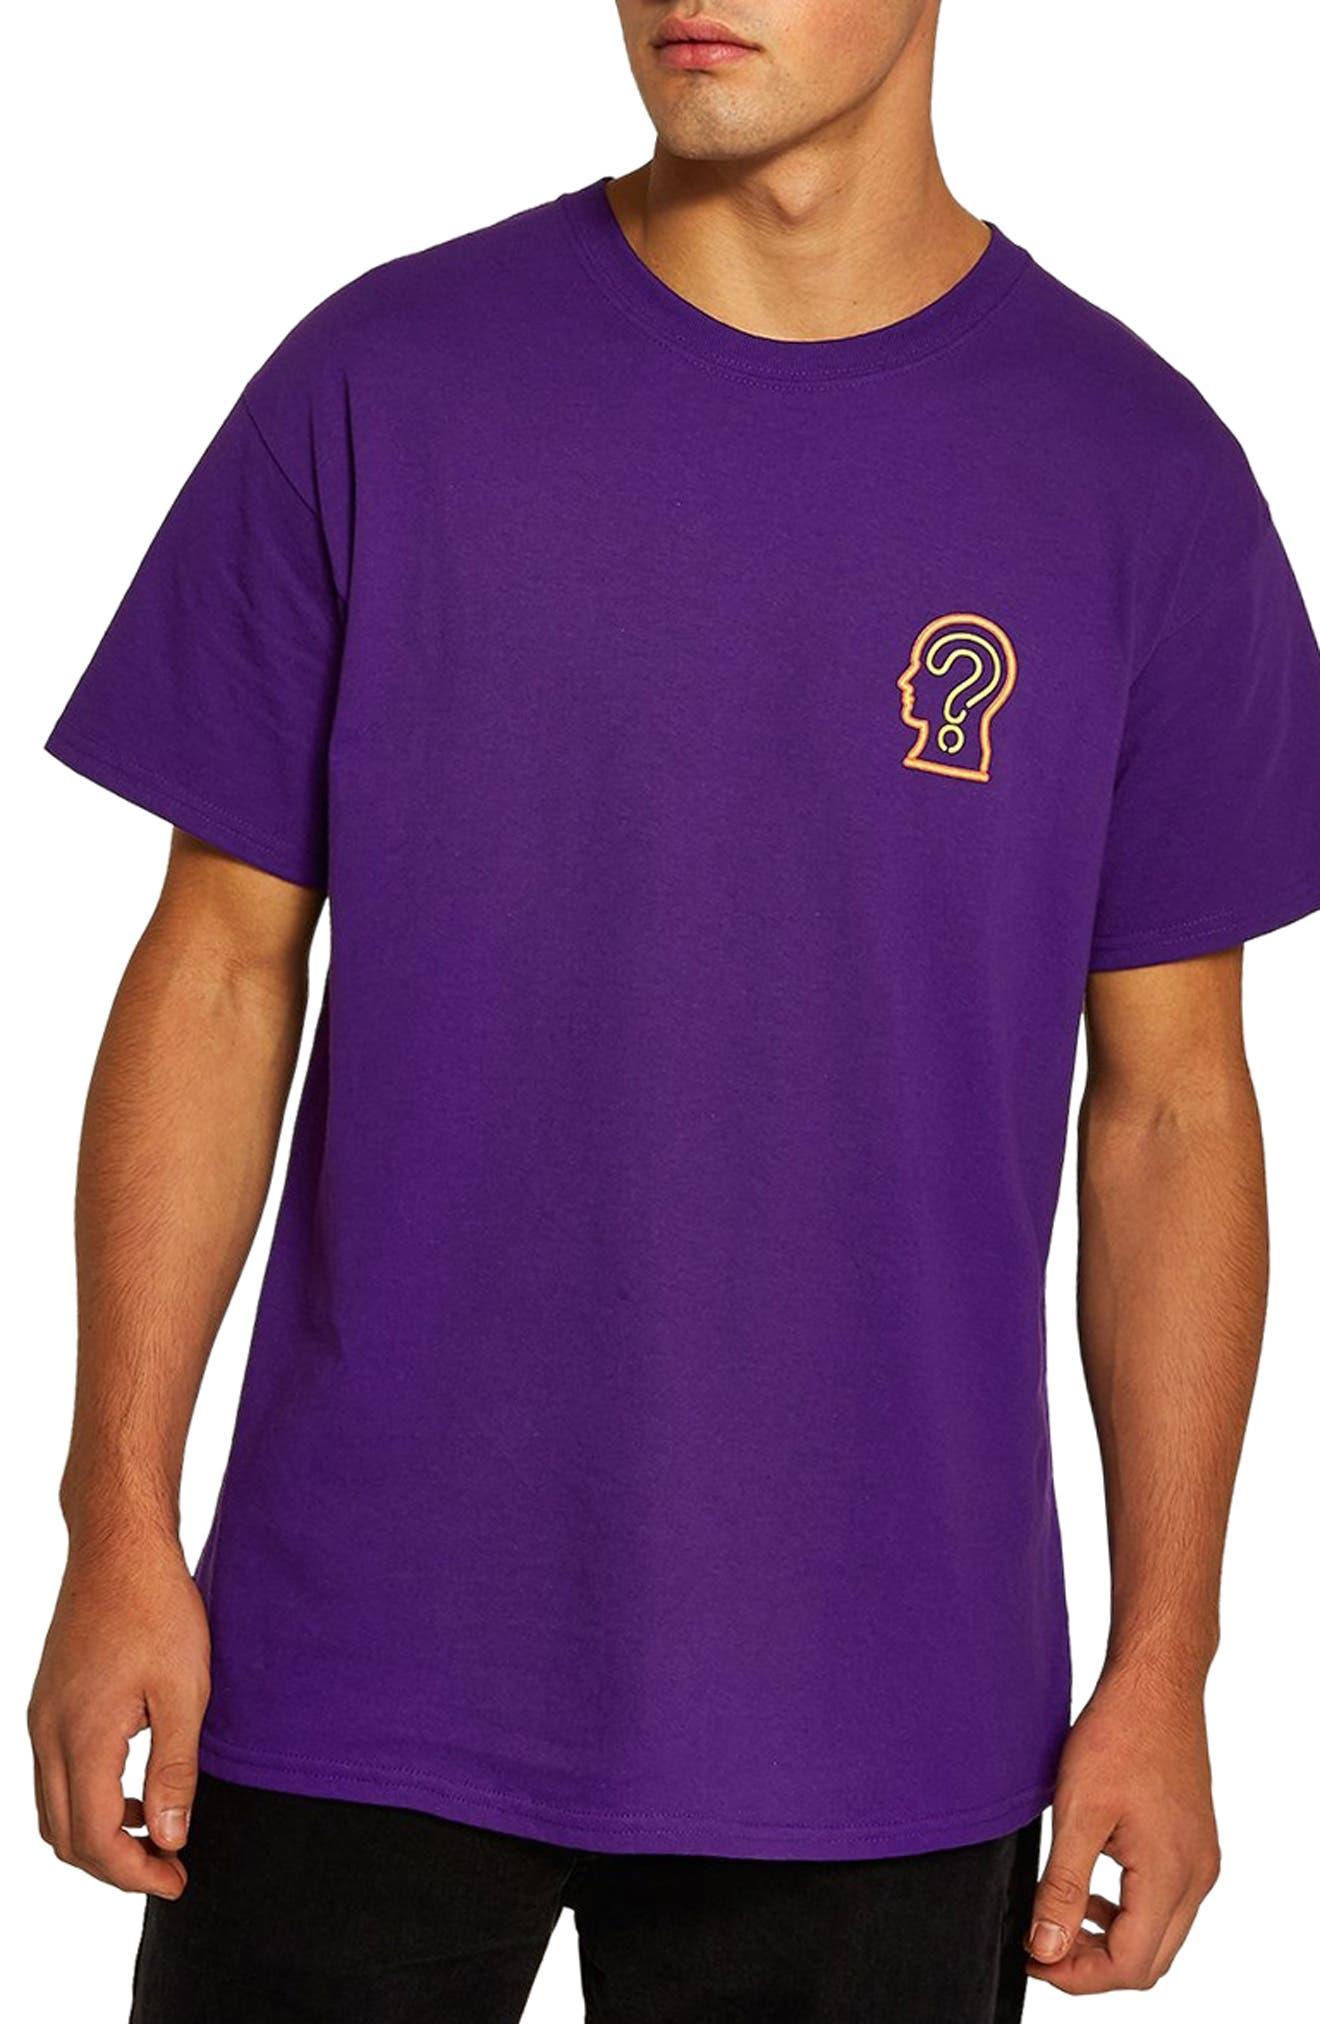 On Your Mind Graphic T-Shirt,                             Main thumbnail 1, color,                             PURPLE MULTI